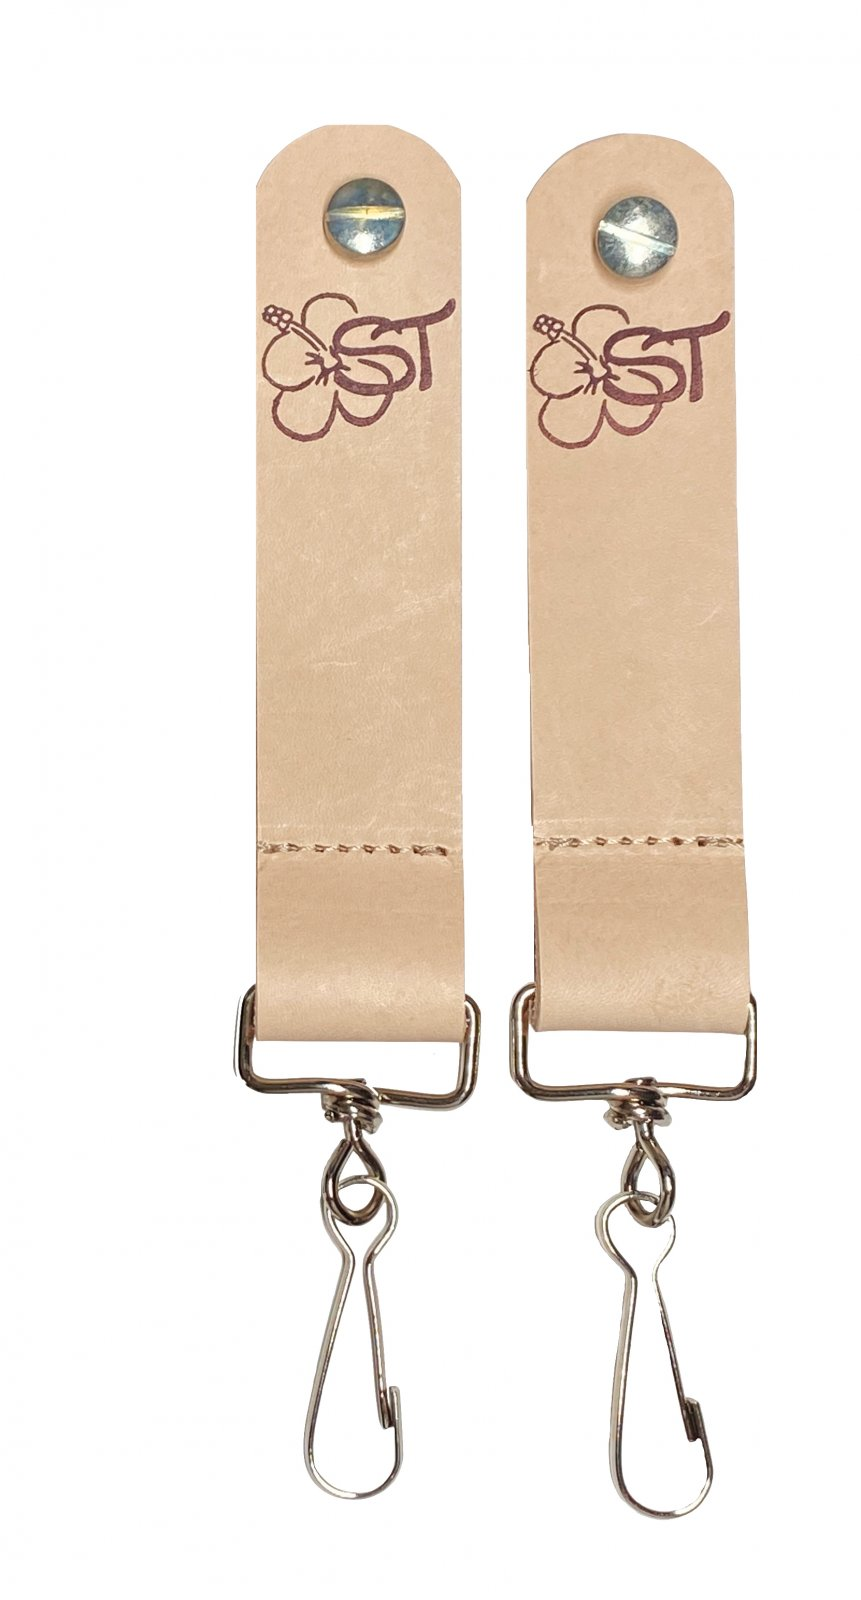 Sherrin's Threads Banjo Strap Adapters (Pair) - Natural